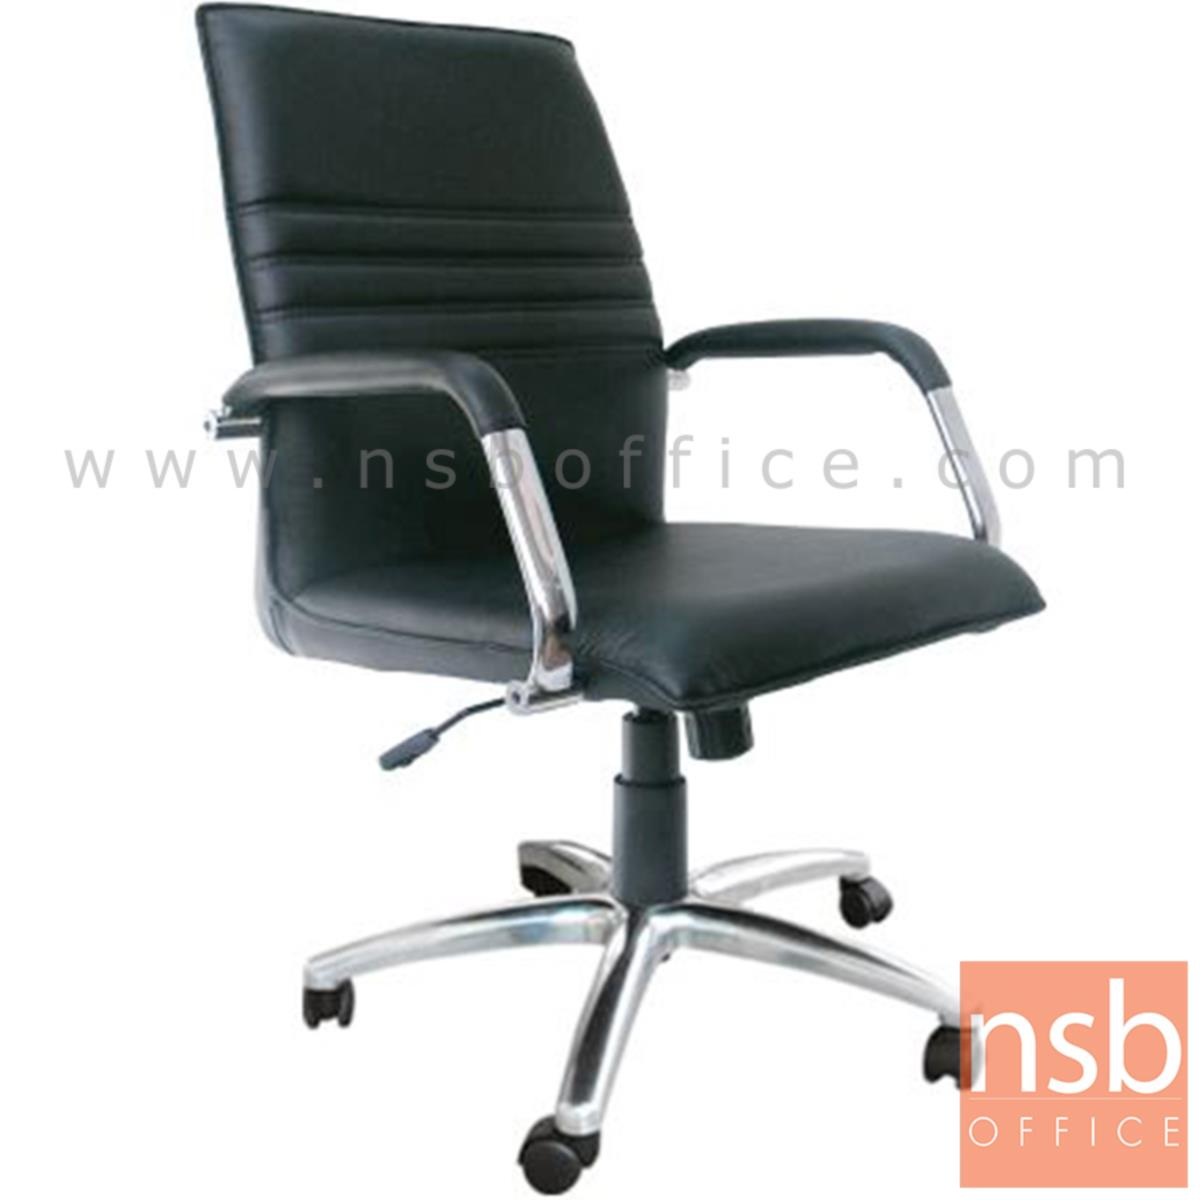 B26A010:เก้าอี้สำนักงาน รุ่น McCoy (แม็คคอย)  โช๊คแก๊ส มีก้อนโยก ขาเหล็กชุบโครเมี่ยม